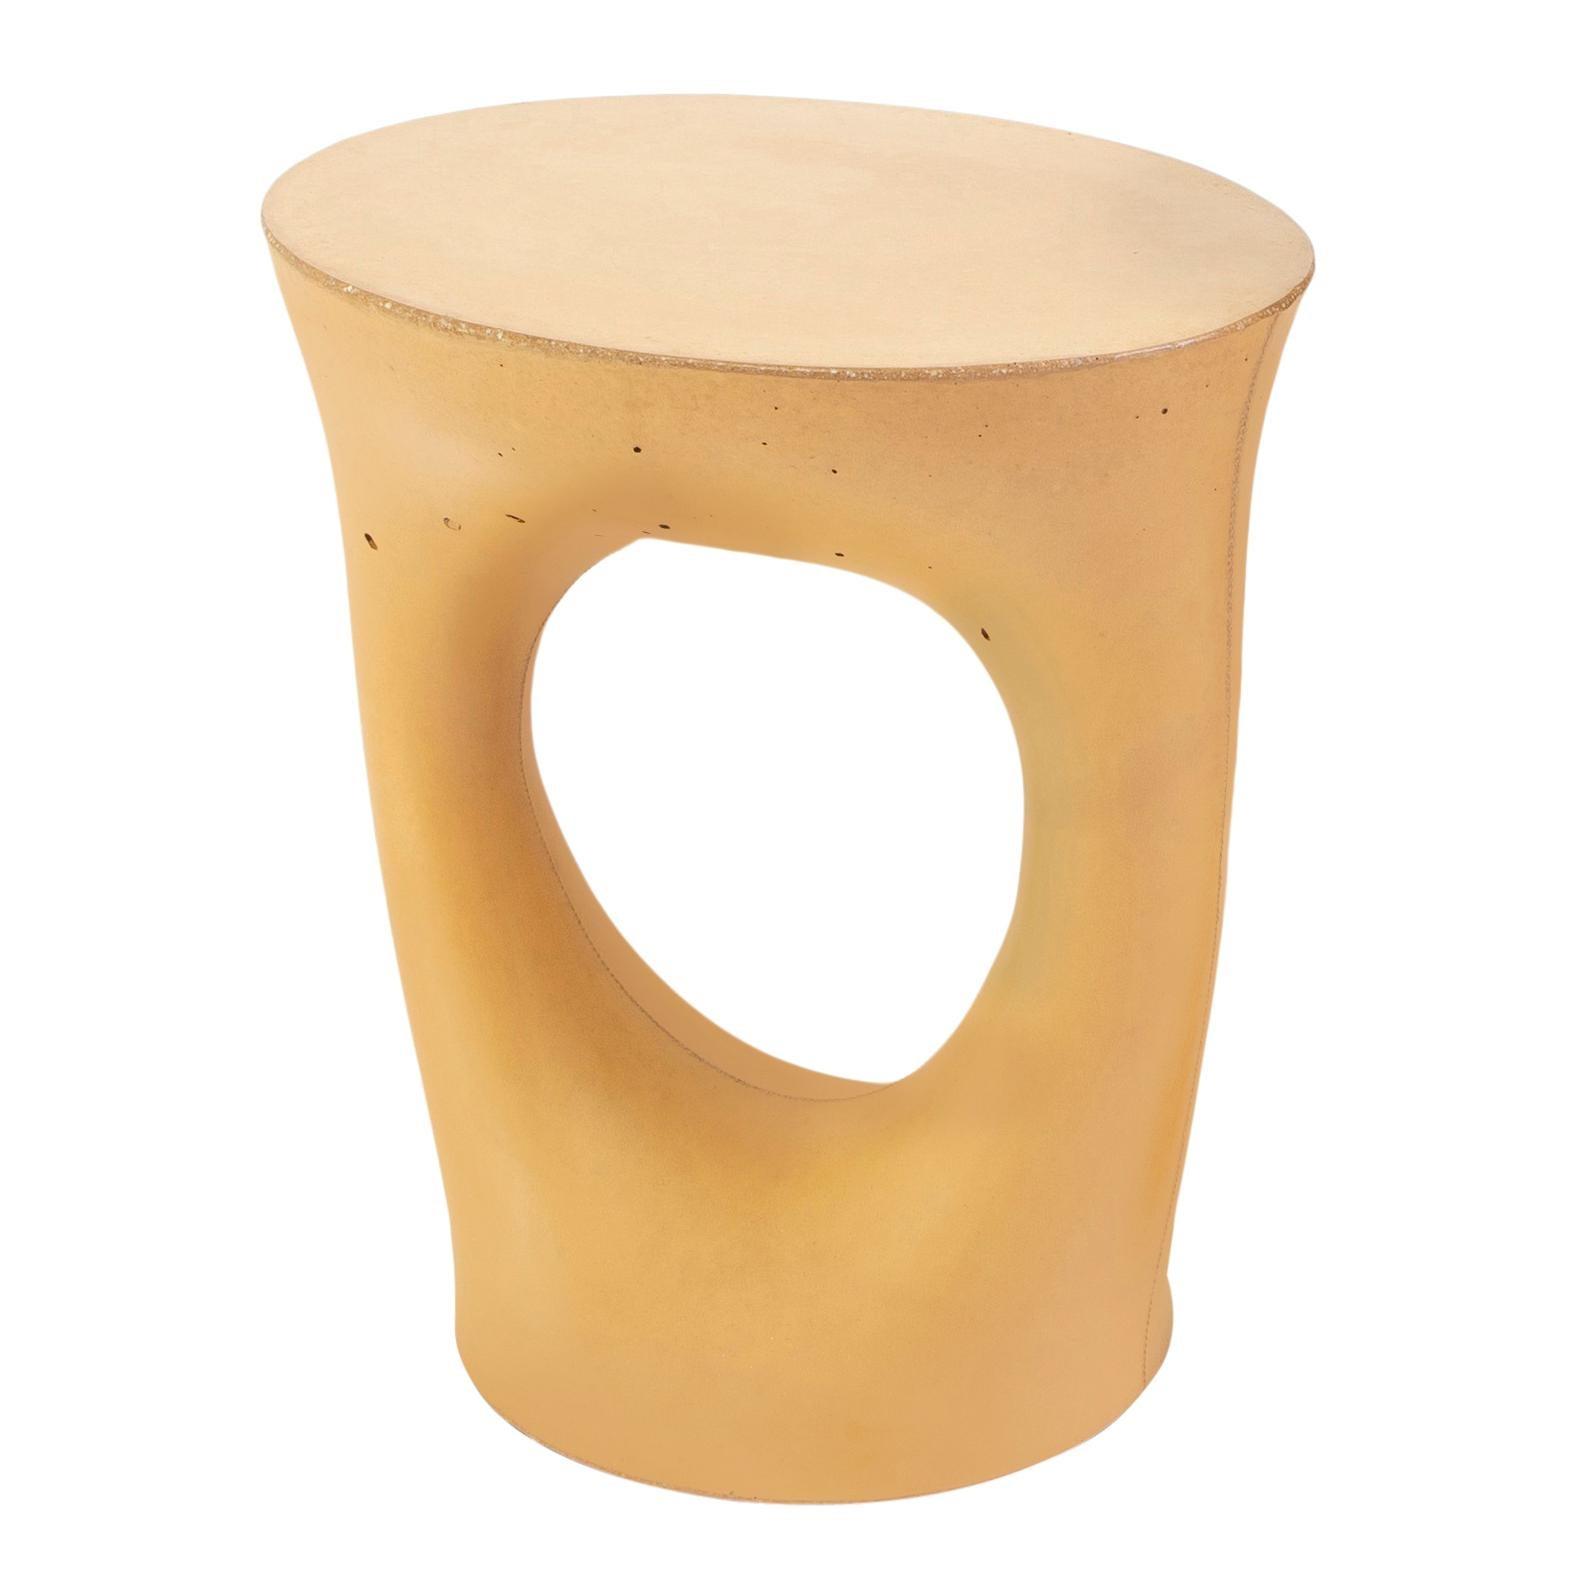 Short Mustard Kreten Side Table from Souda, Made to Order